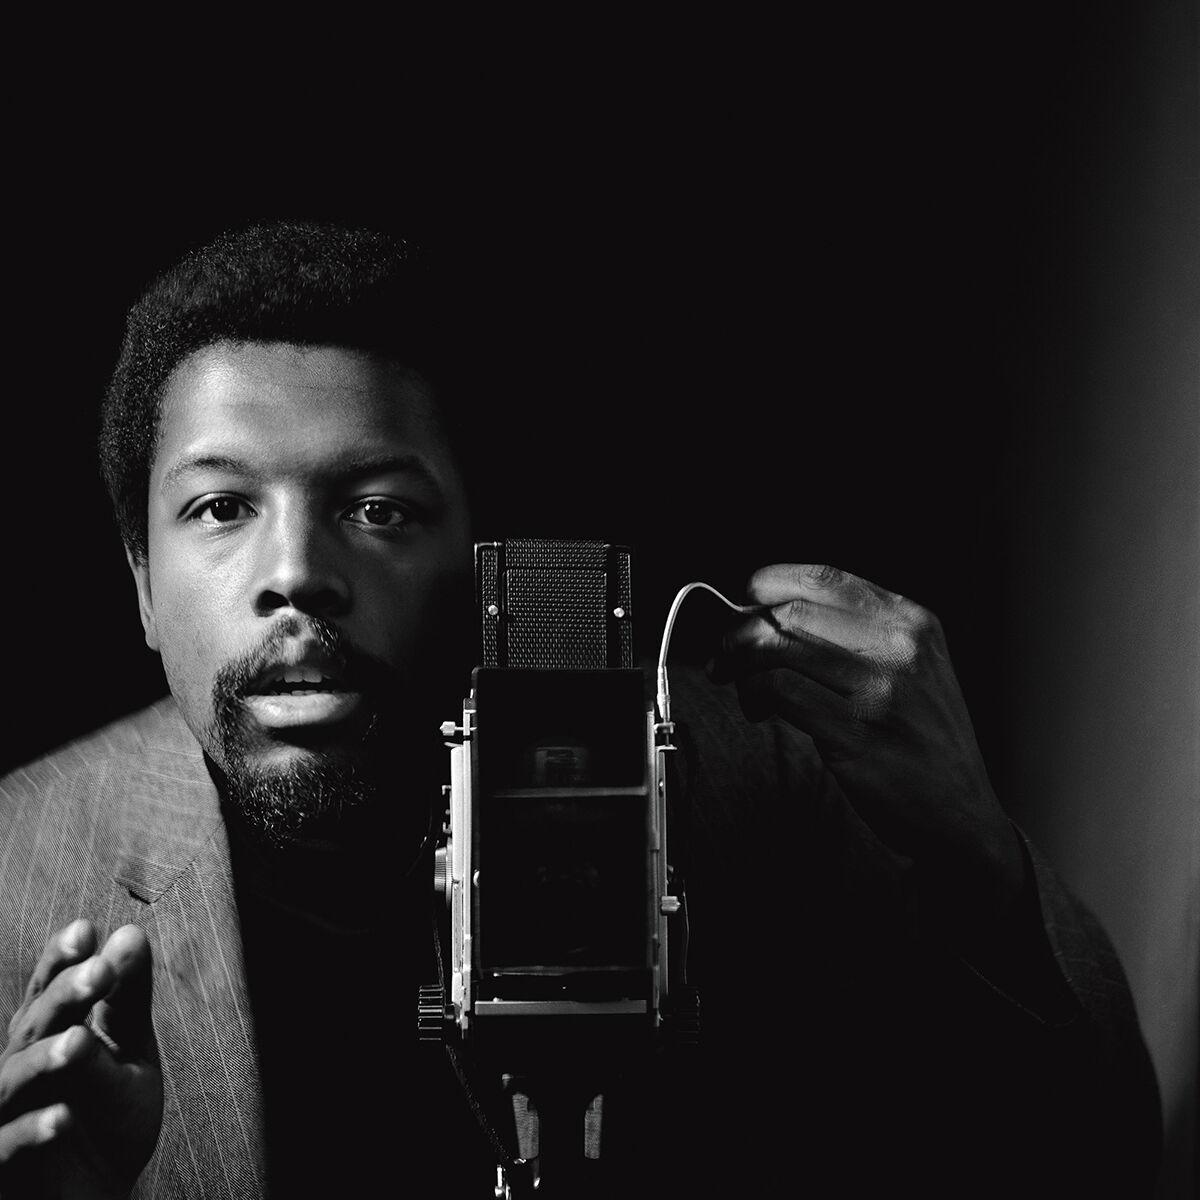 Kwame Brathwaite, Self-portrait, African Jazz-Art Society & Studios (AJASS), Harlem, ca. 1964, from Kwame Brathwaite: Black Is Beautiful, Aperture, 2019. © Kwame Brathwaite.